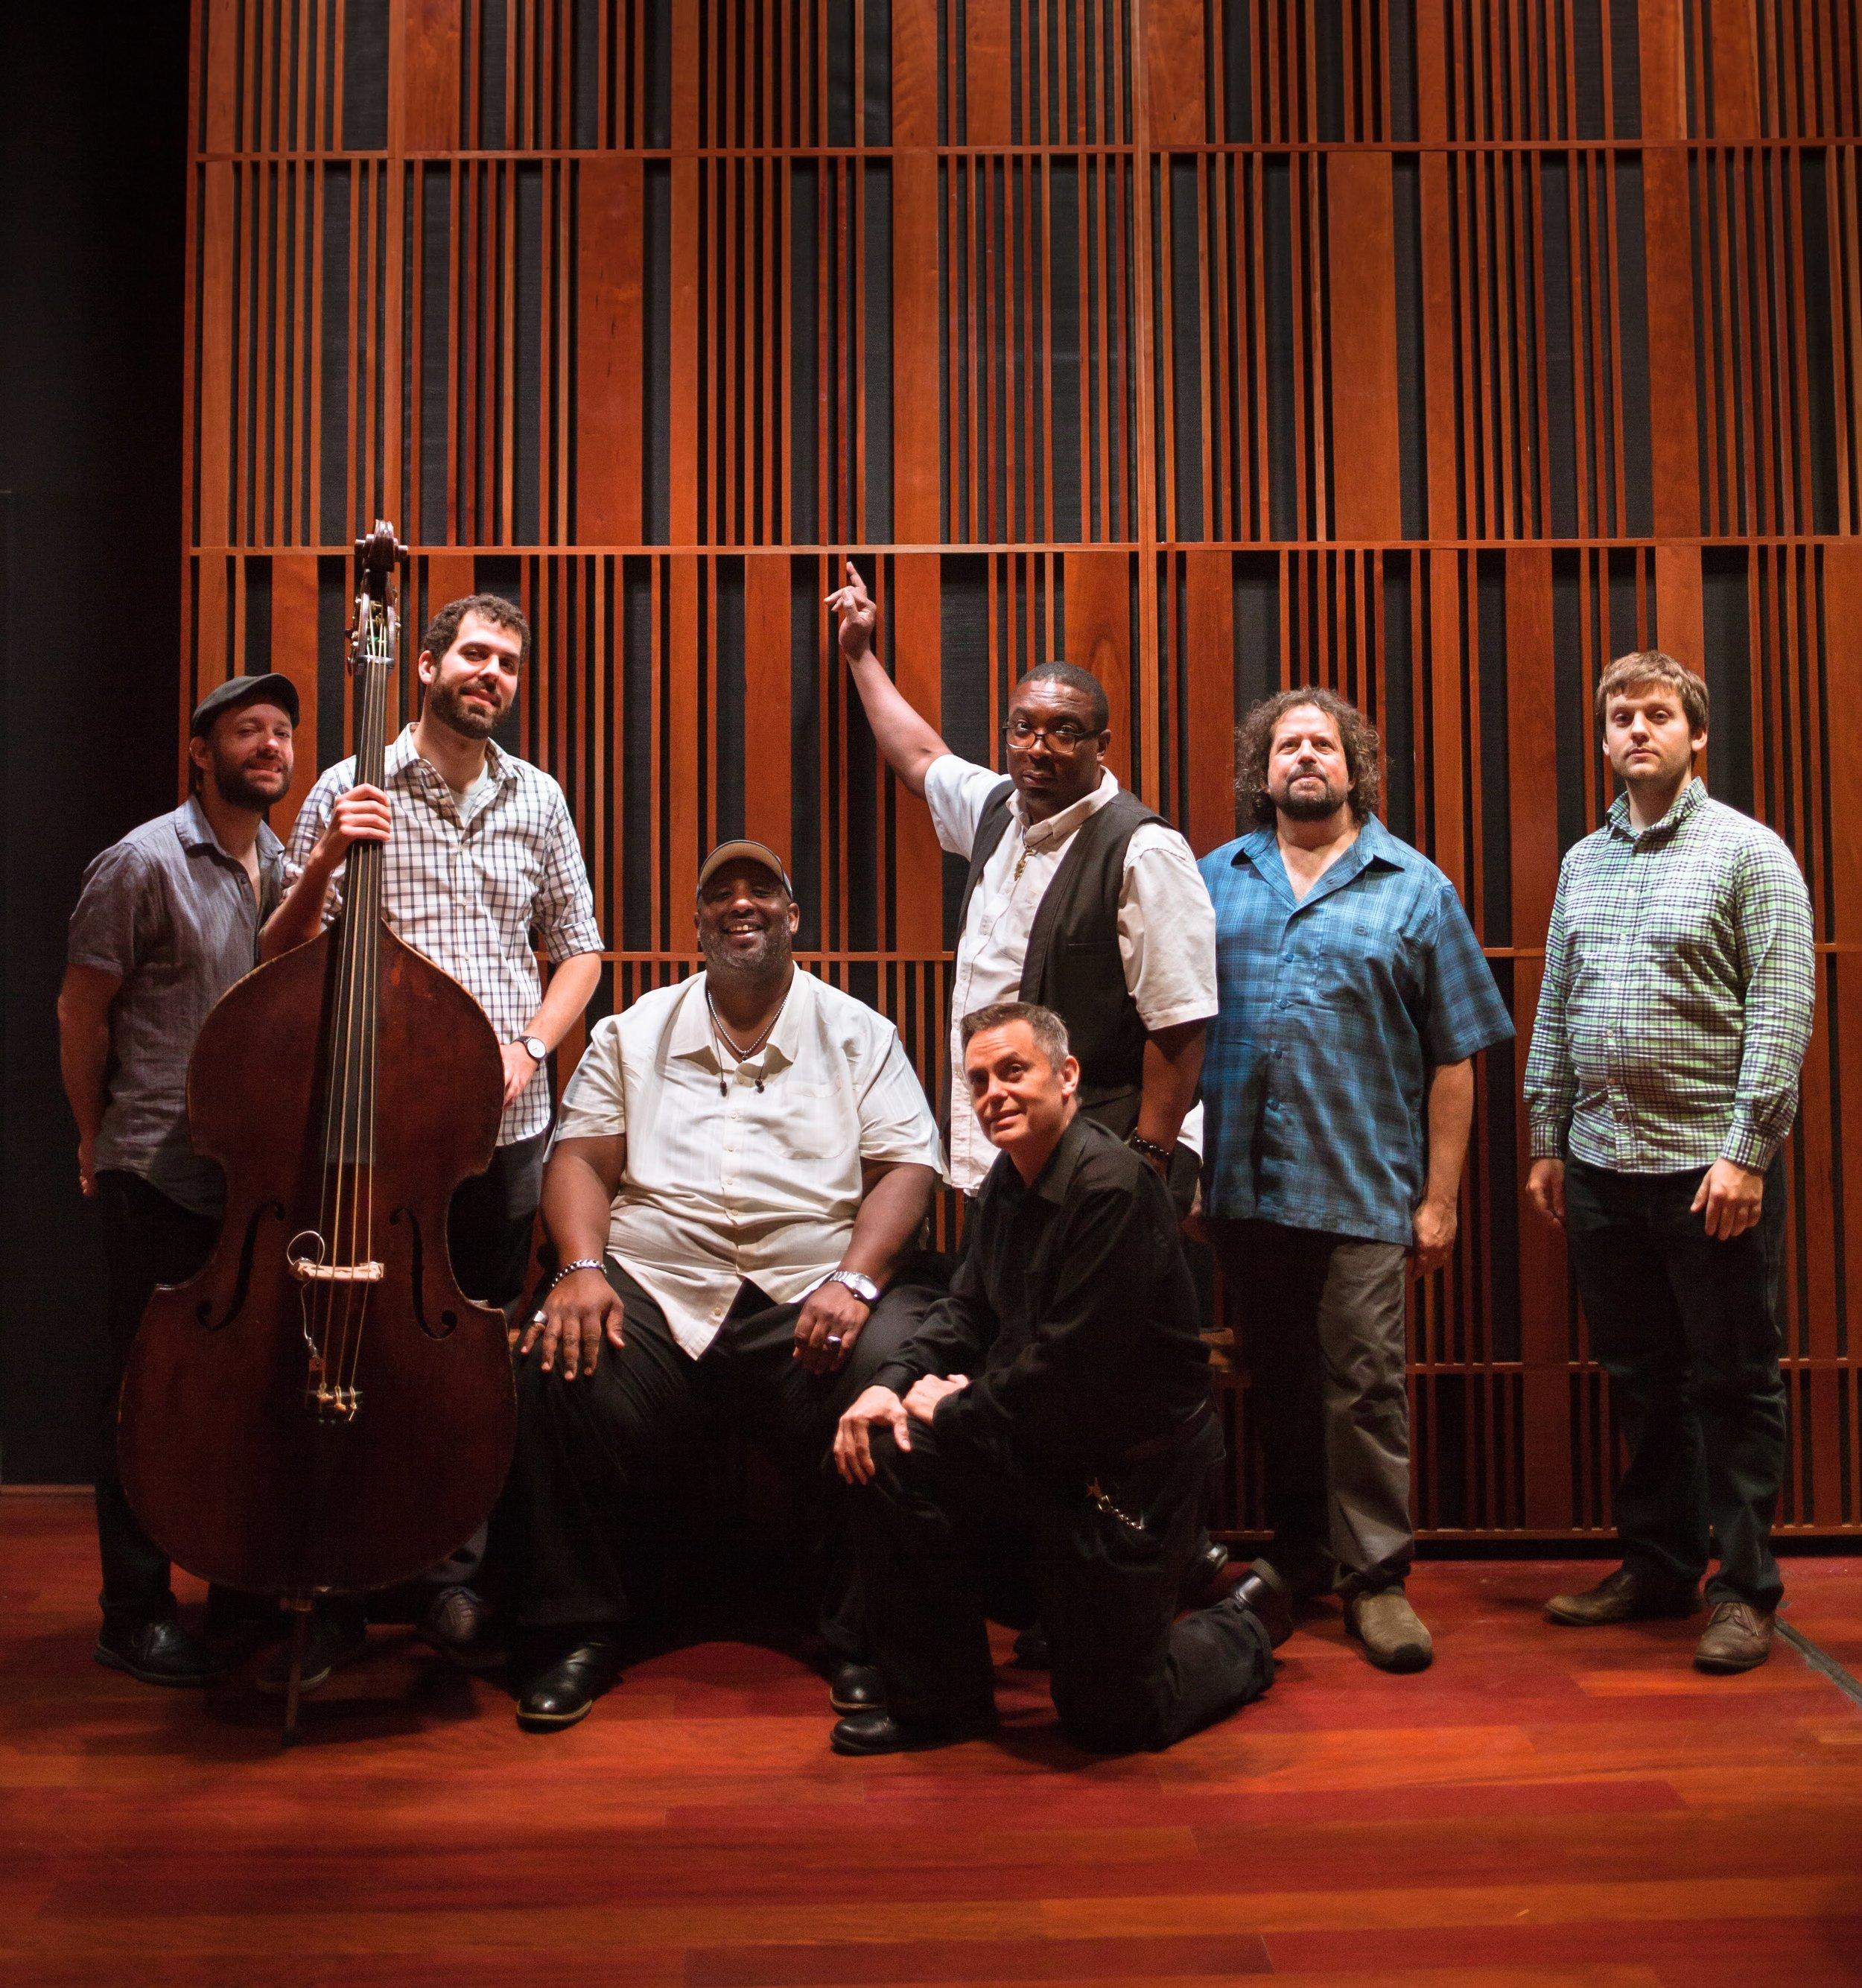 new_orleans_catahoulas_full_band_pose_magnolia_entertainment